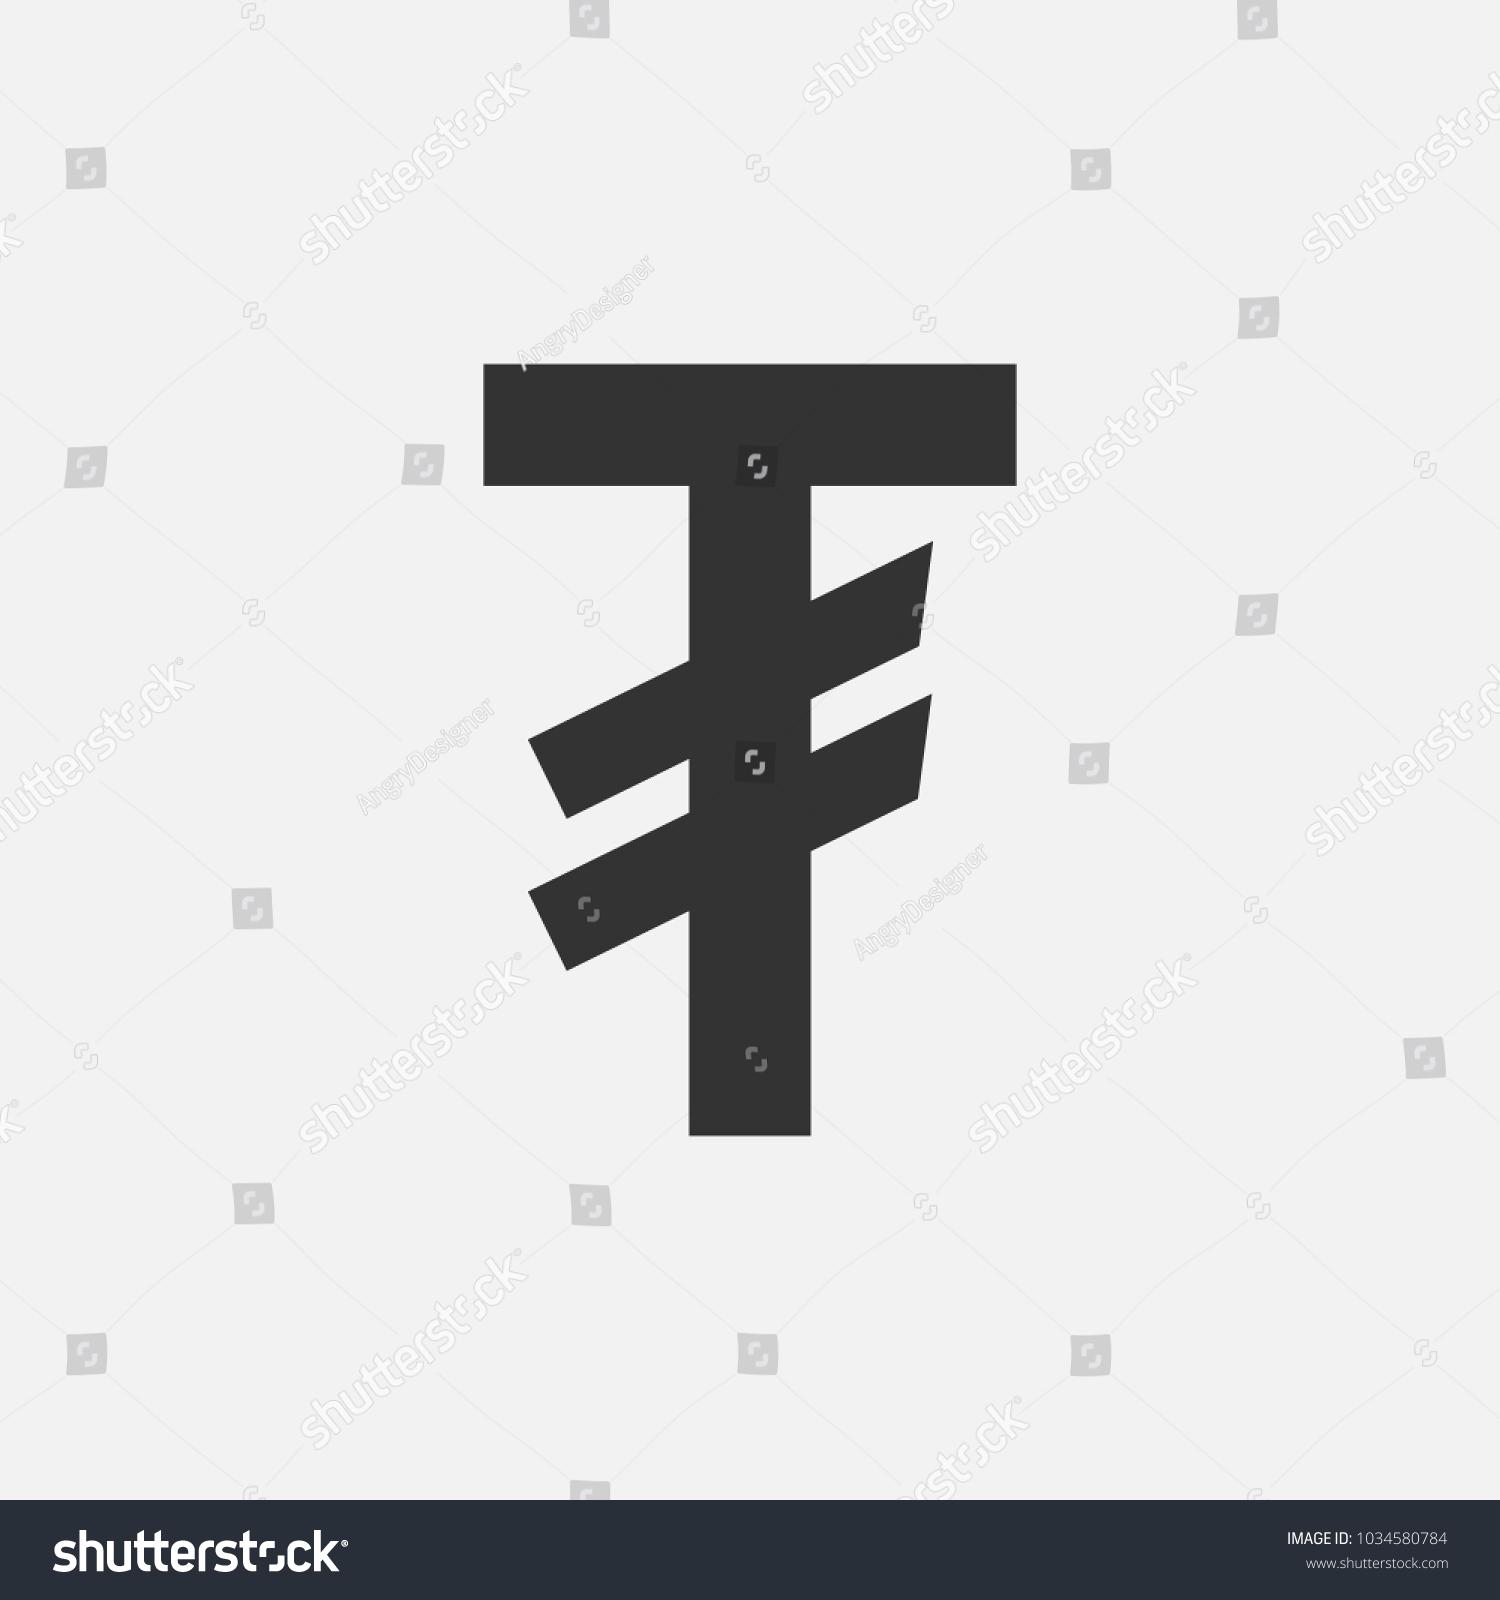 Symbol currency mongolian tugrik vector illustration stock vector symbol of the currency mongolian tugrik vector illustration buycottarizona Gallery